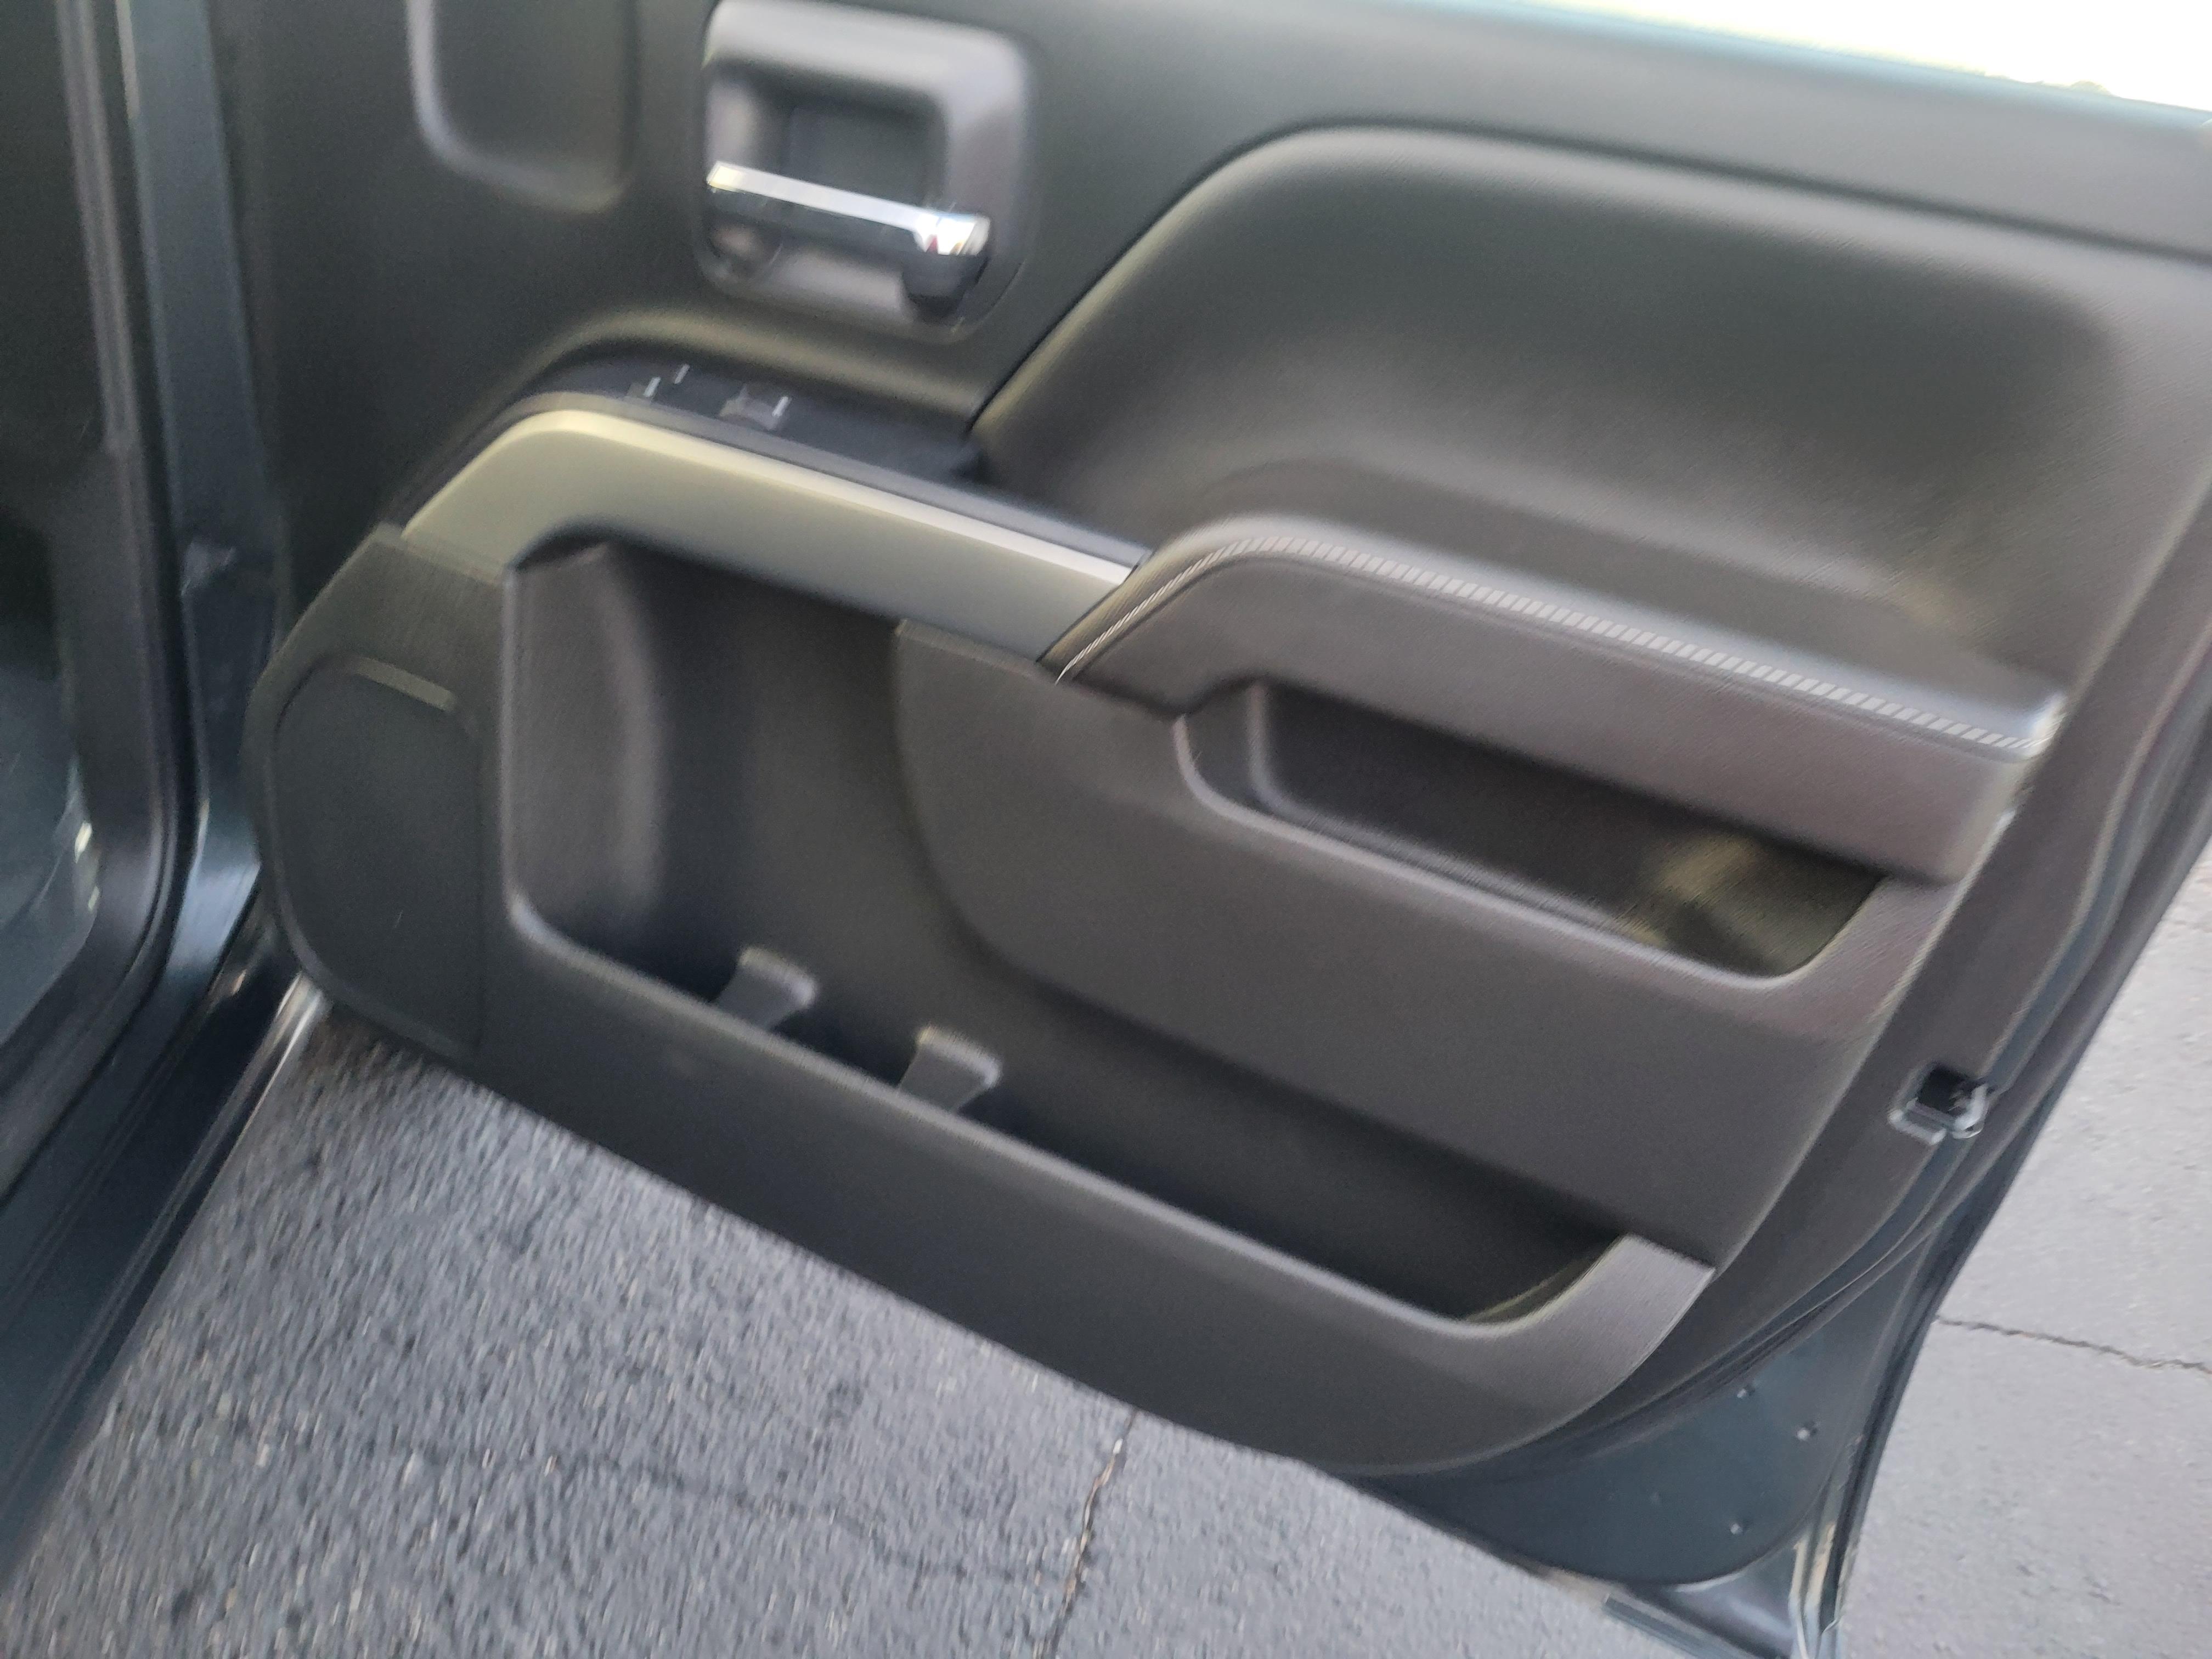 used vehicle - Truck CHEVROLET SILVERADO 1500 2017